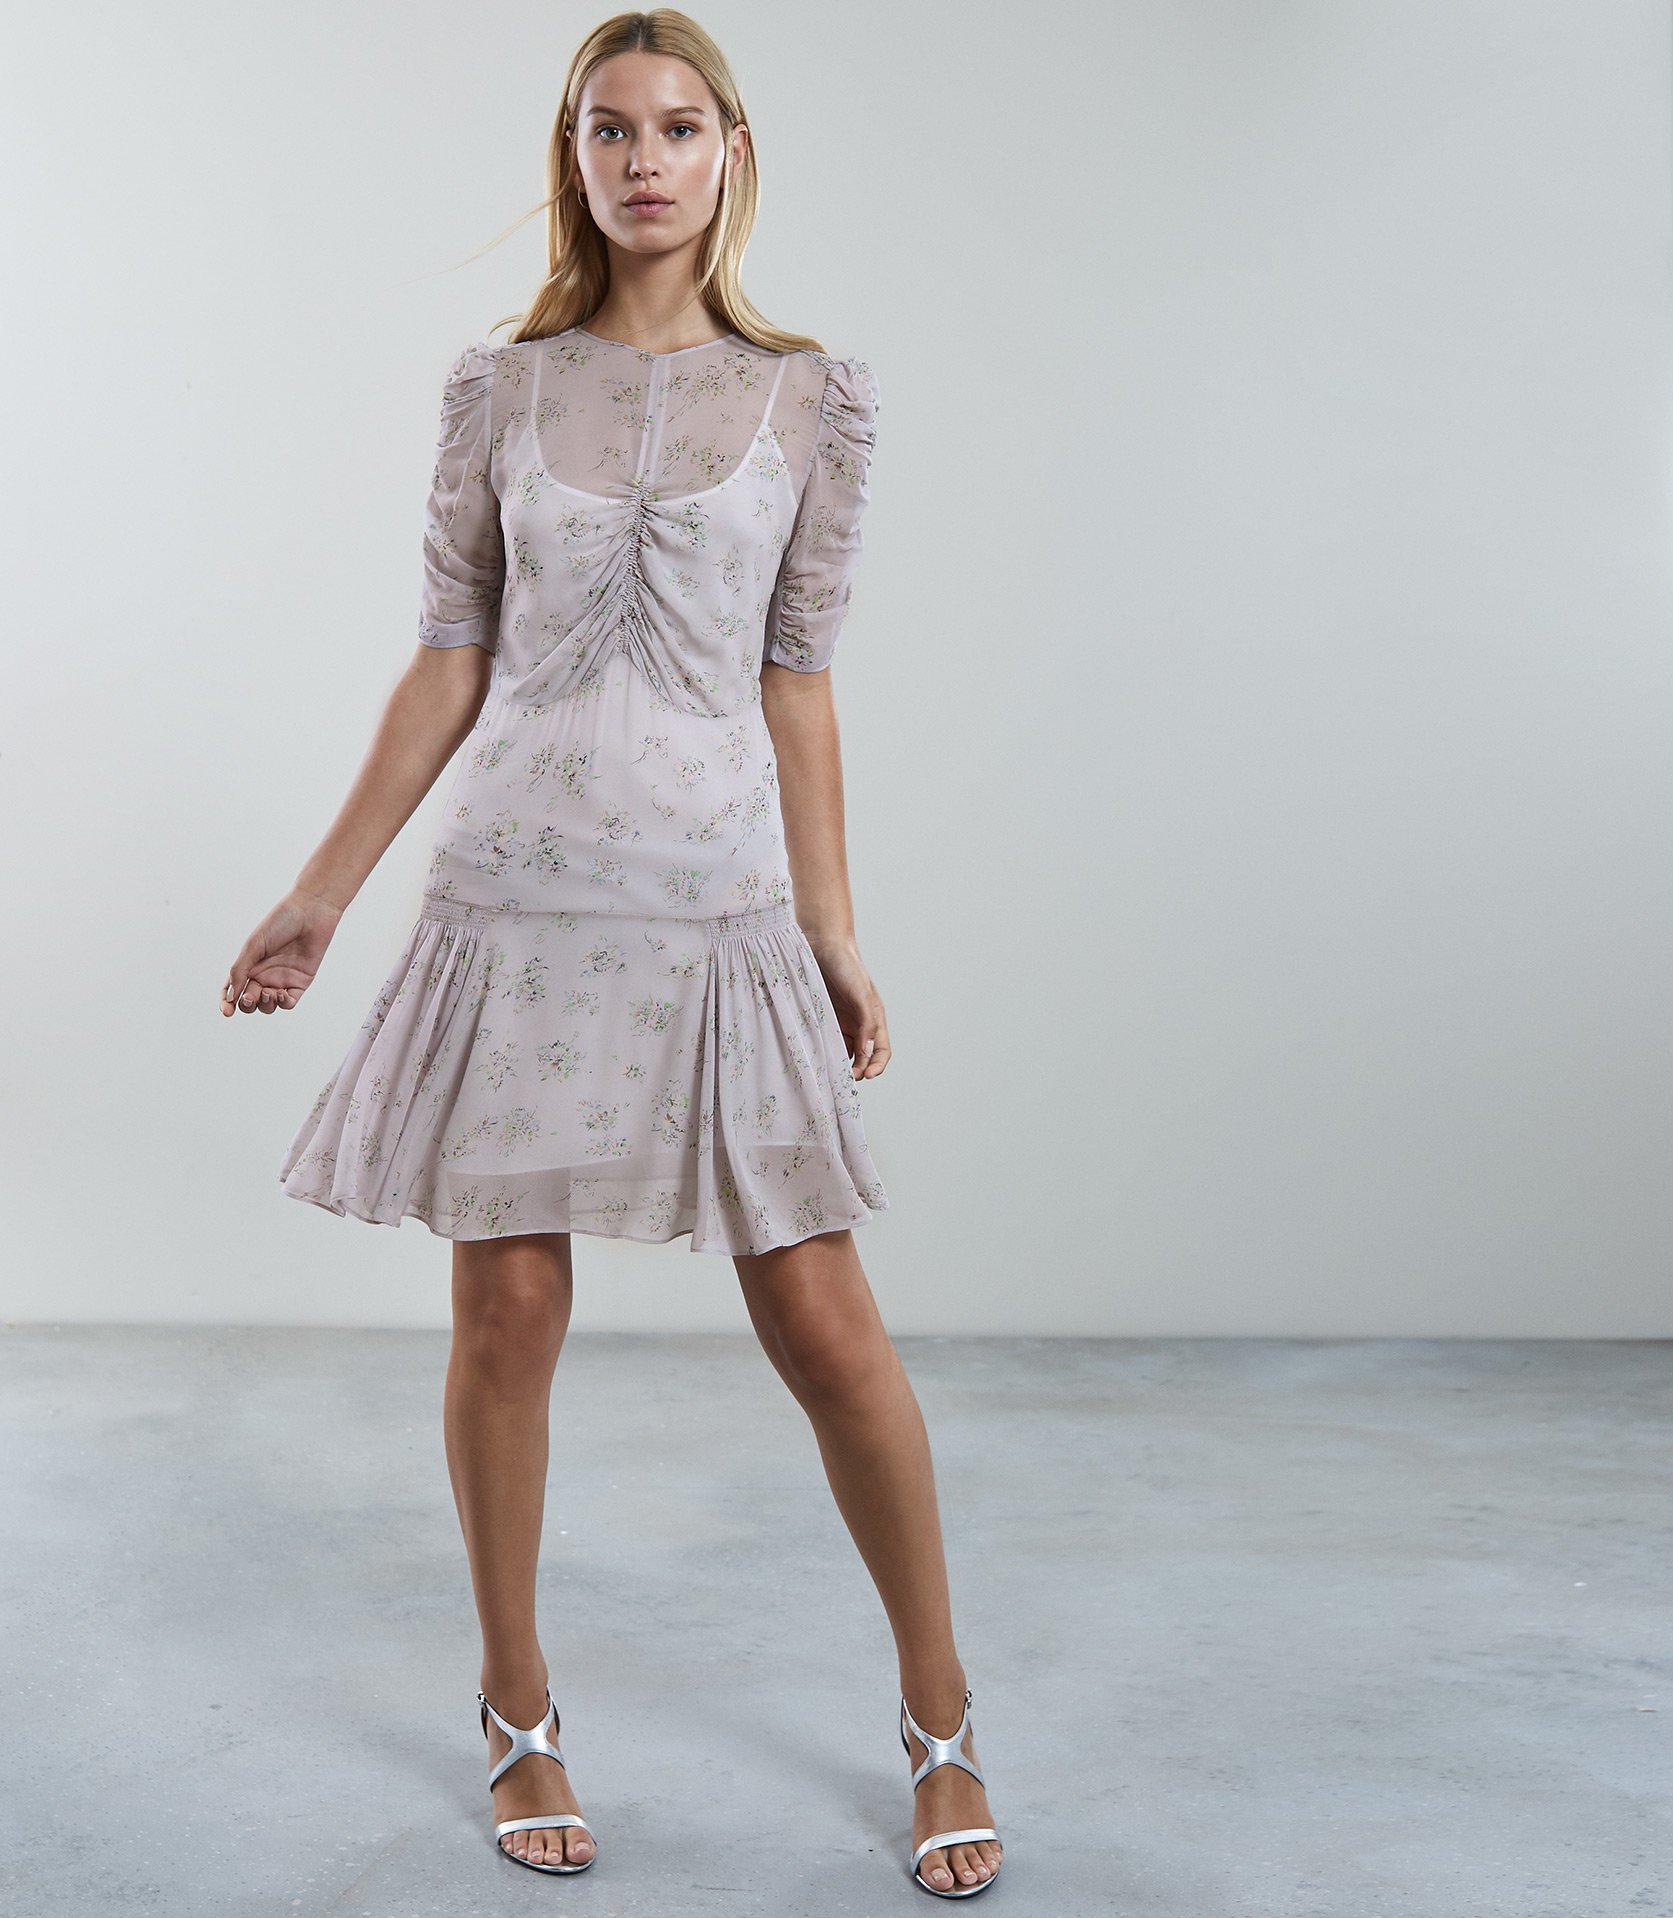 62ec51856fcf2 Rae Ditsy Print Tea Dress | Endource